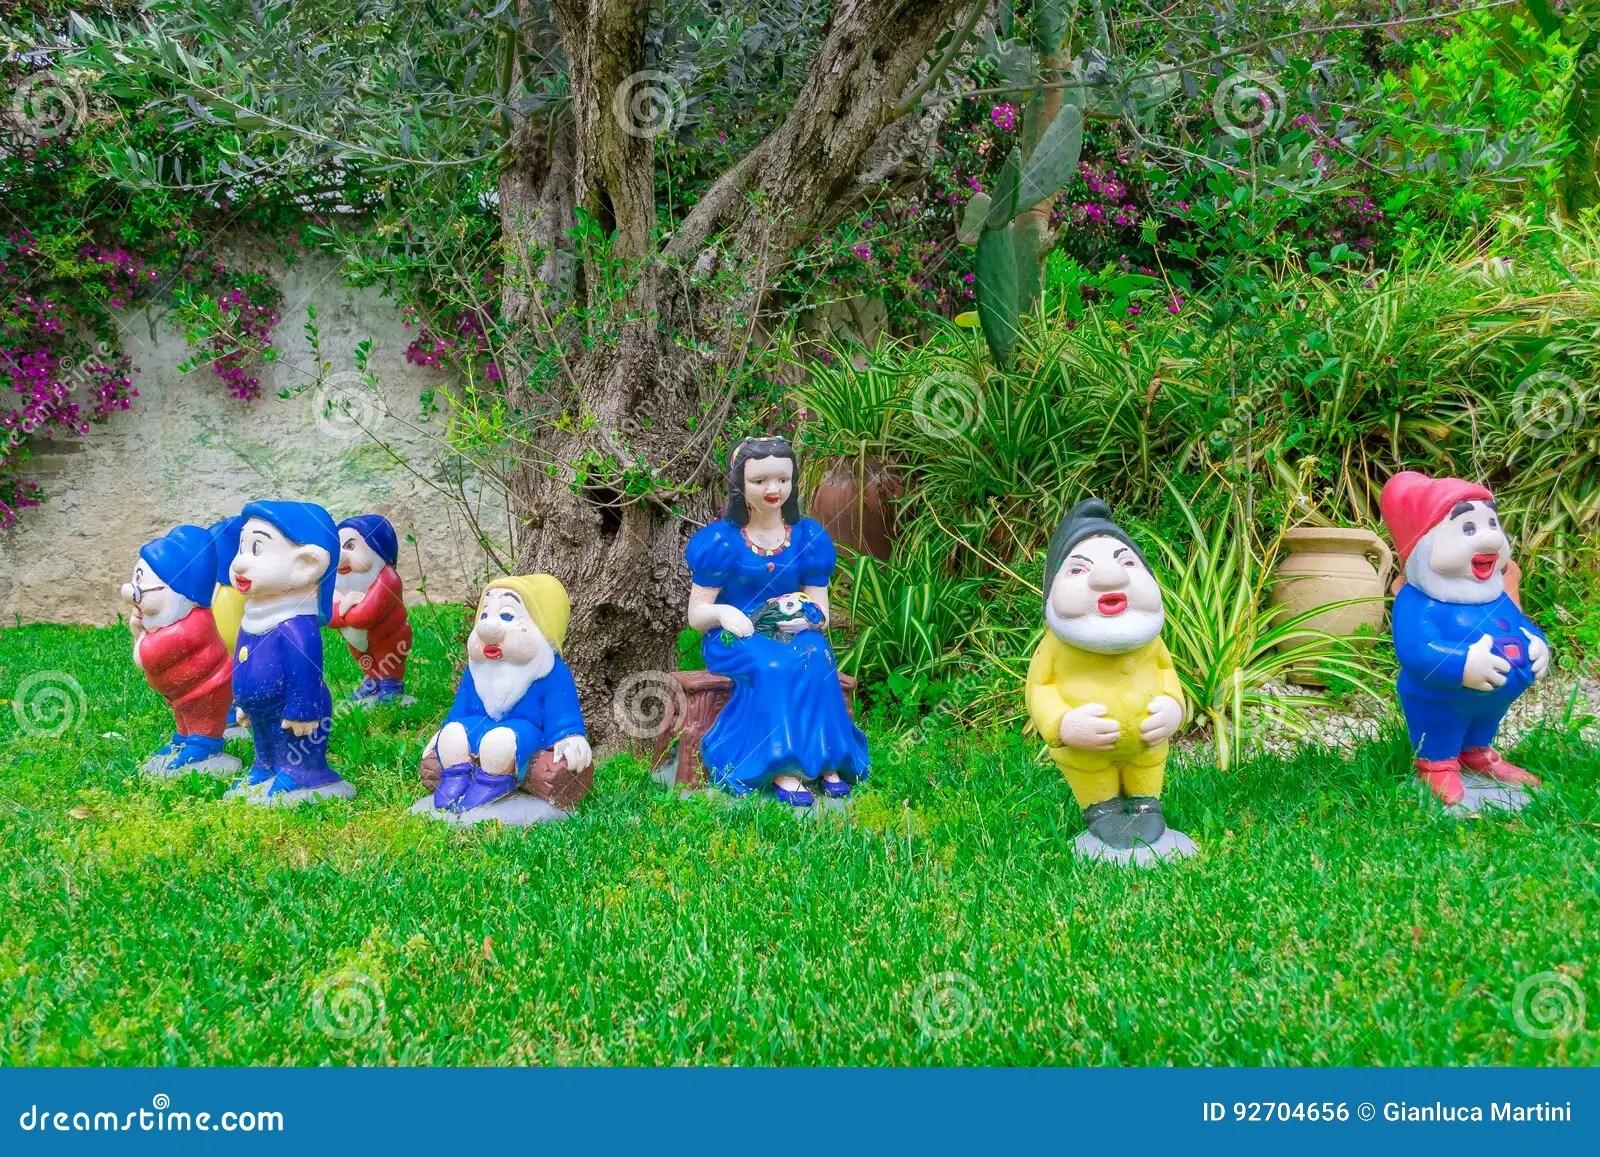 Nani Da Giardino In Plastica.Nani Da Giardino Disney Us 45 59 24 Di Sconto Disney Cartoon